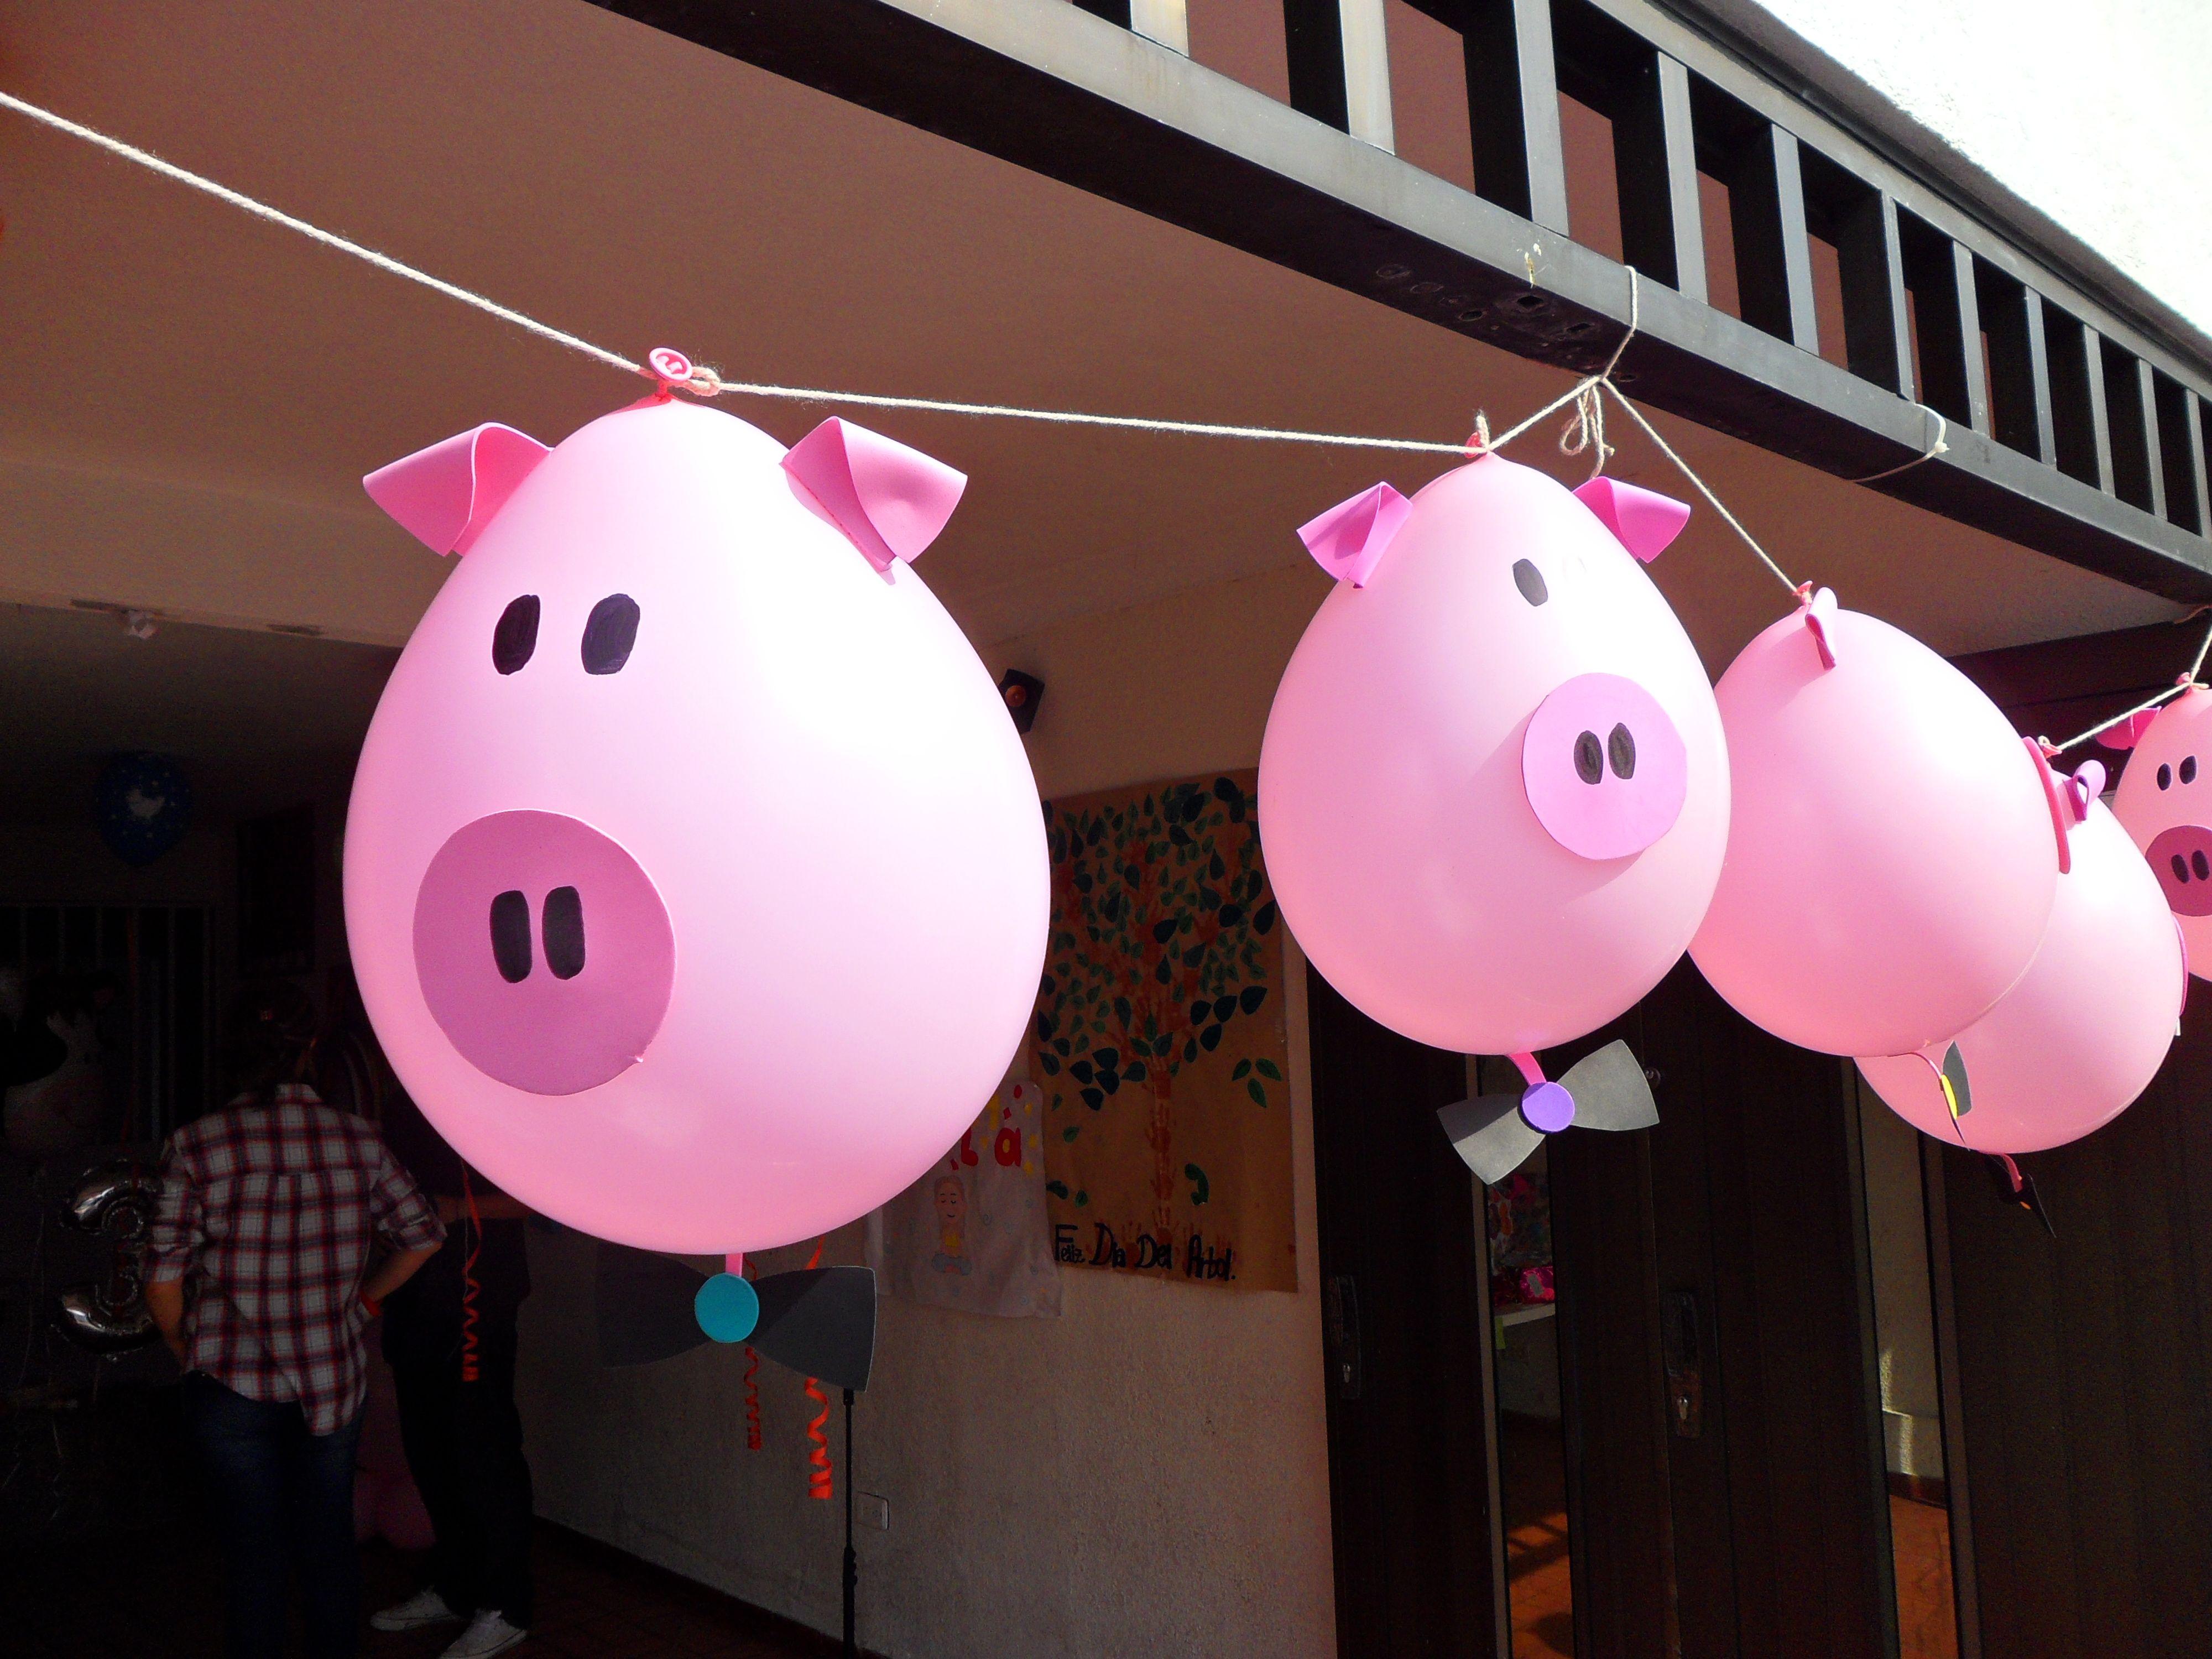 Decoracion con bombas para fiesta infantiles de granja - Bombas de cumpleanos ...